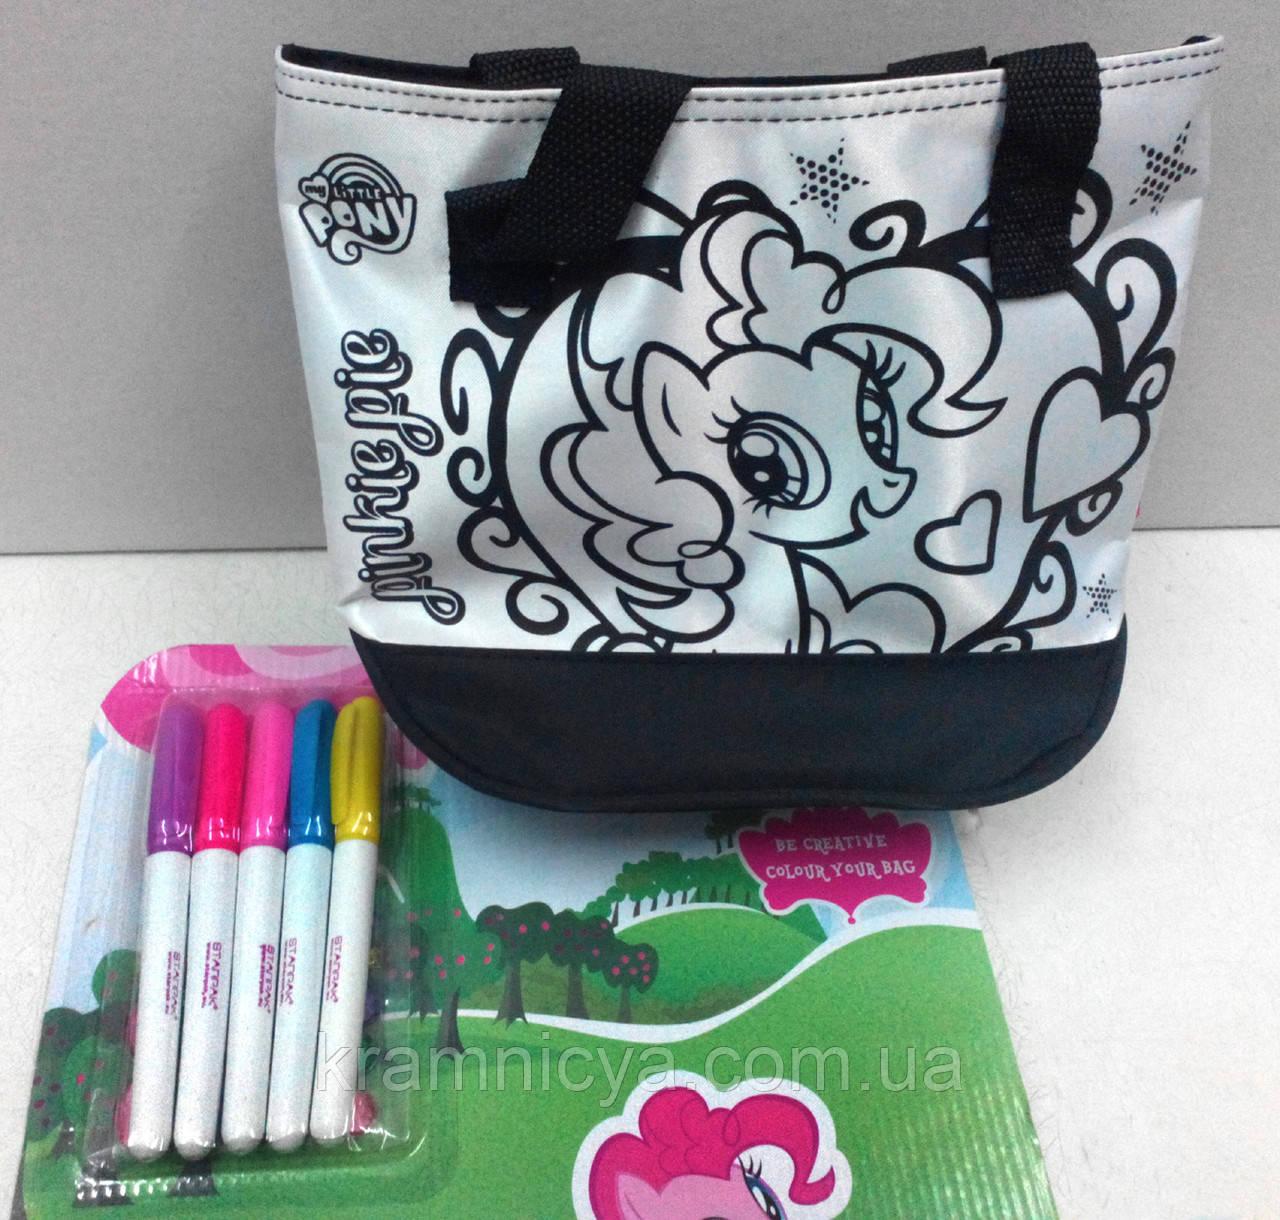 Набор для творчества: Раскрась свою сумочку My Little Pony